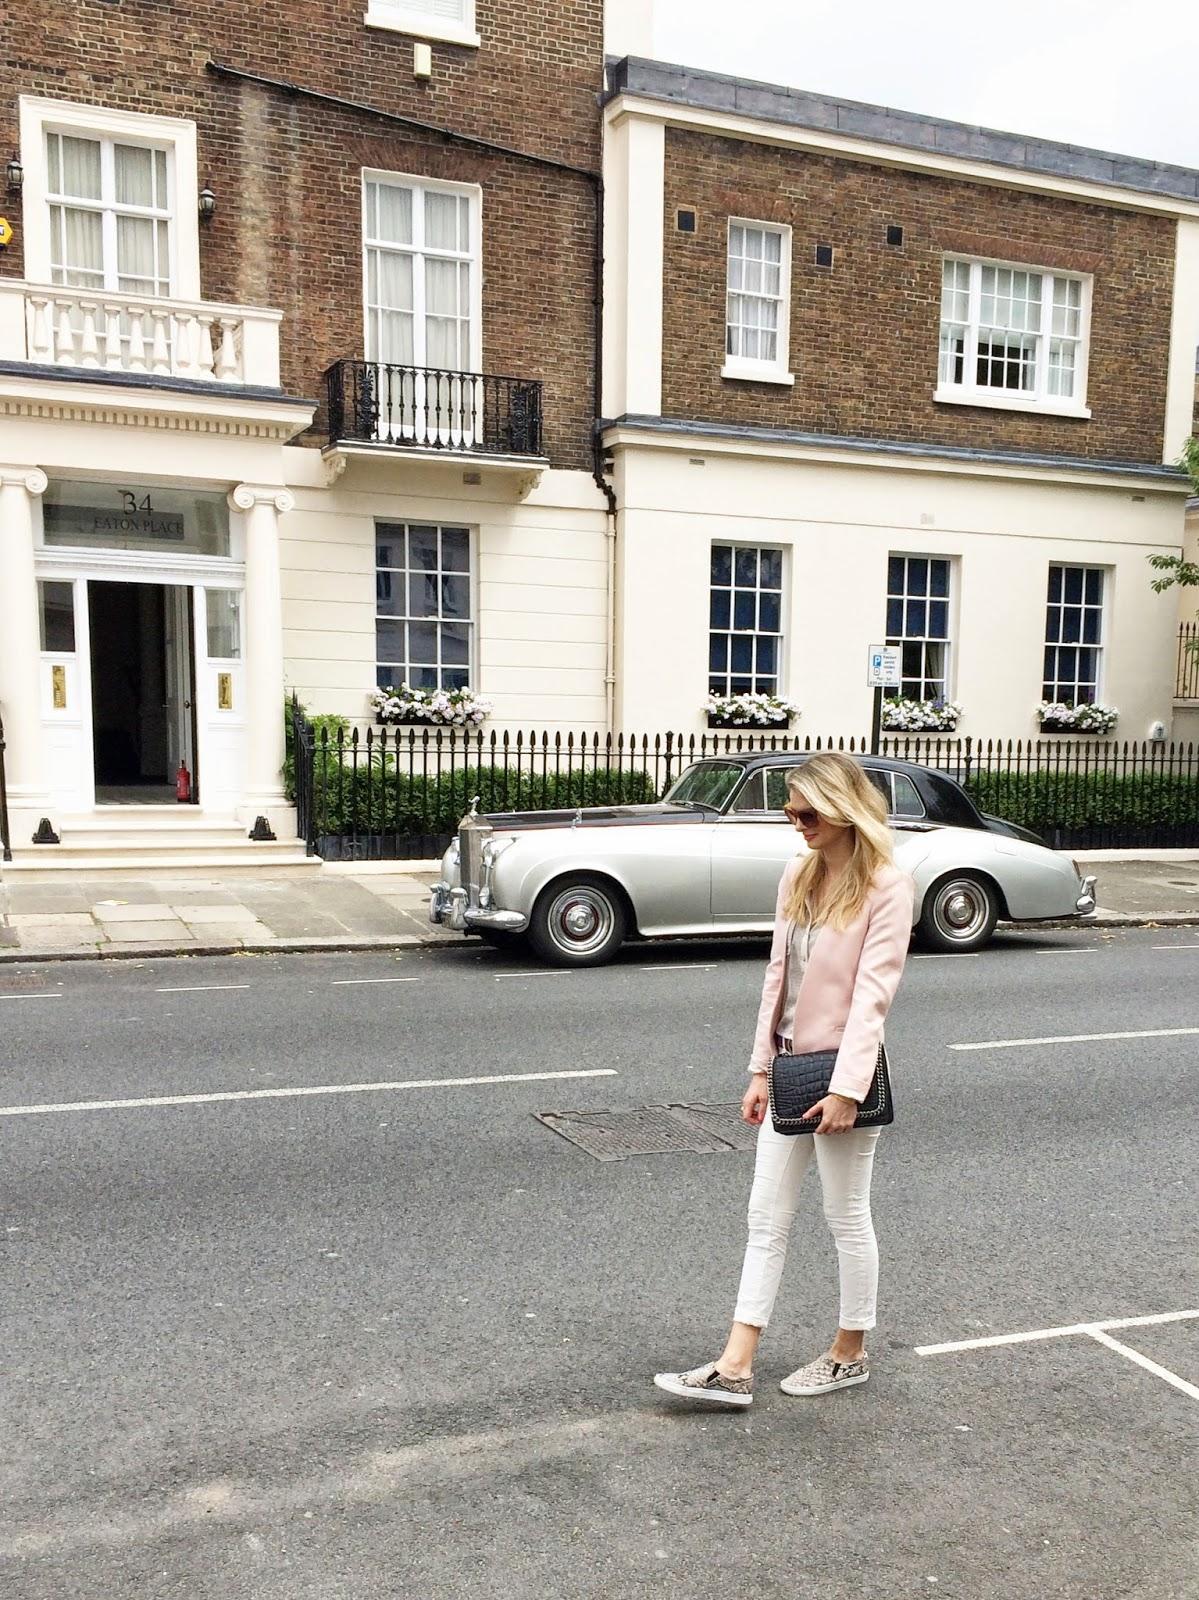 street style, london, london fashion blogger, white jeans, white skinny jeans, j brand jeans, j brand skinny jeans, slip ons, pink blazer, black bag, zara croco bag